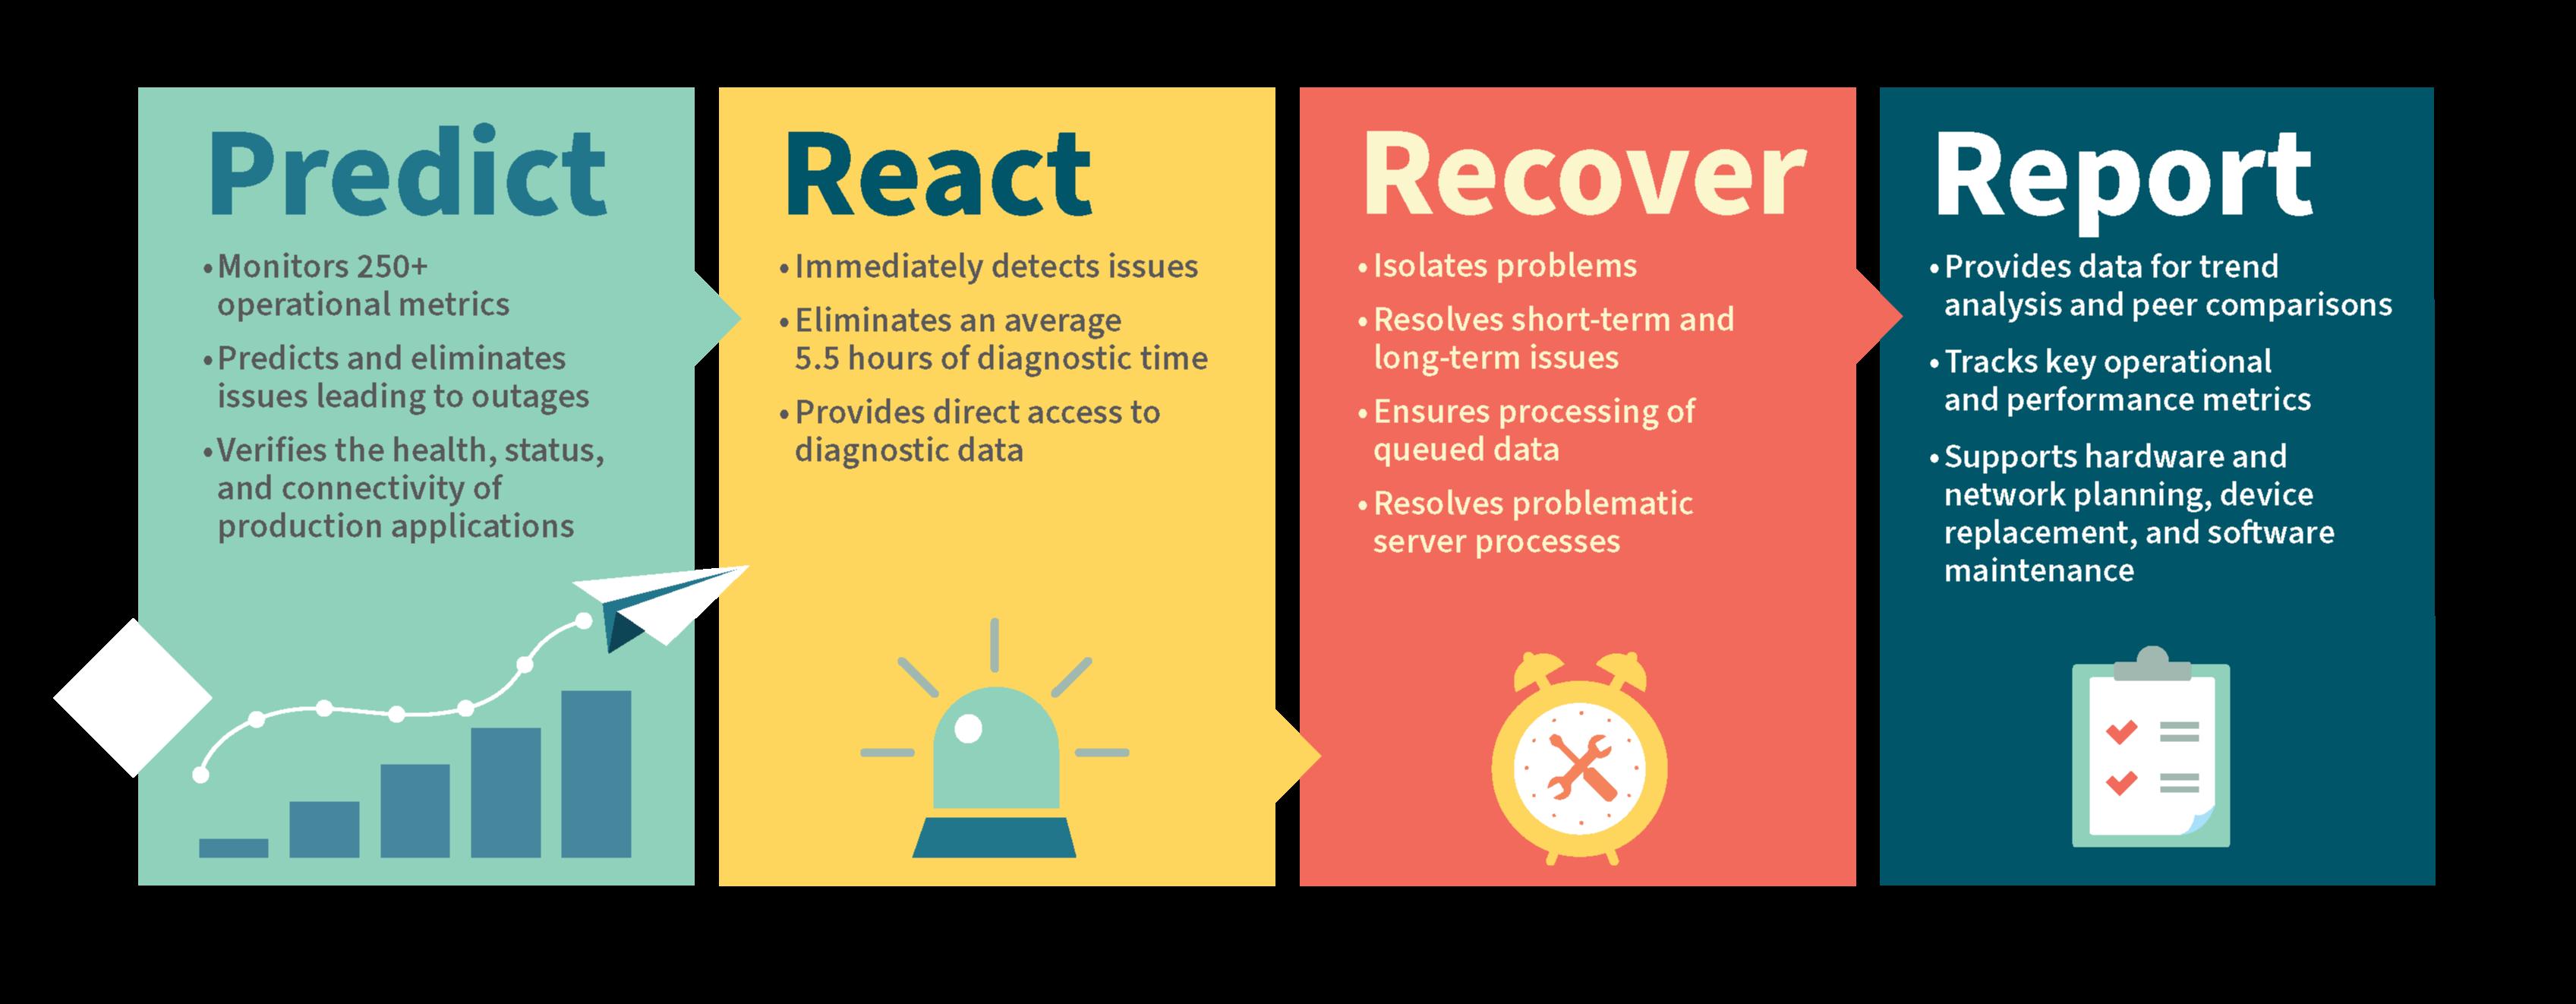 predict-react-recover-report